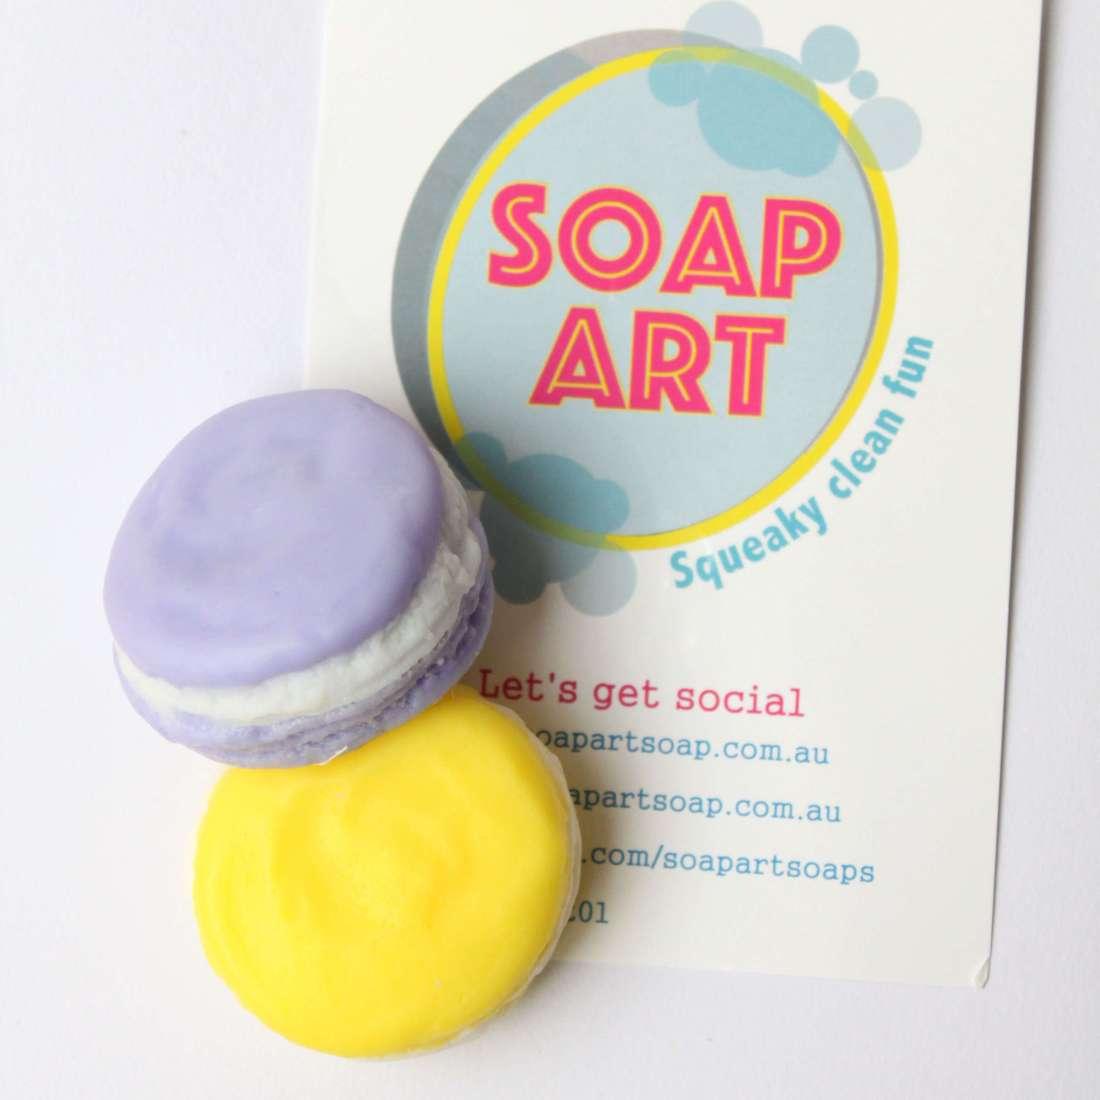 Soap Art - Macaron soaps